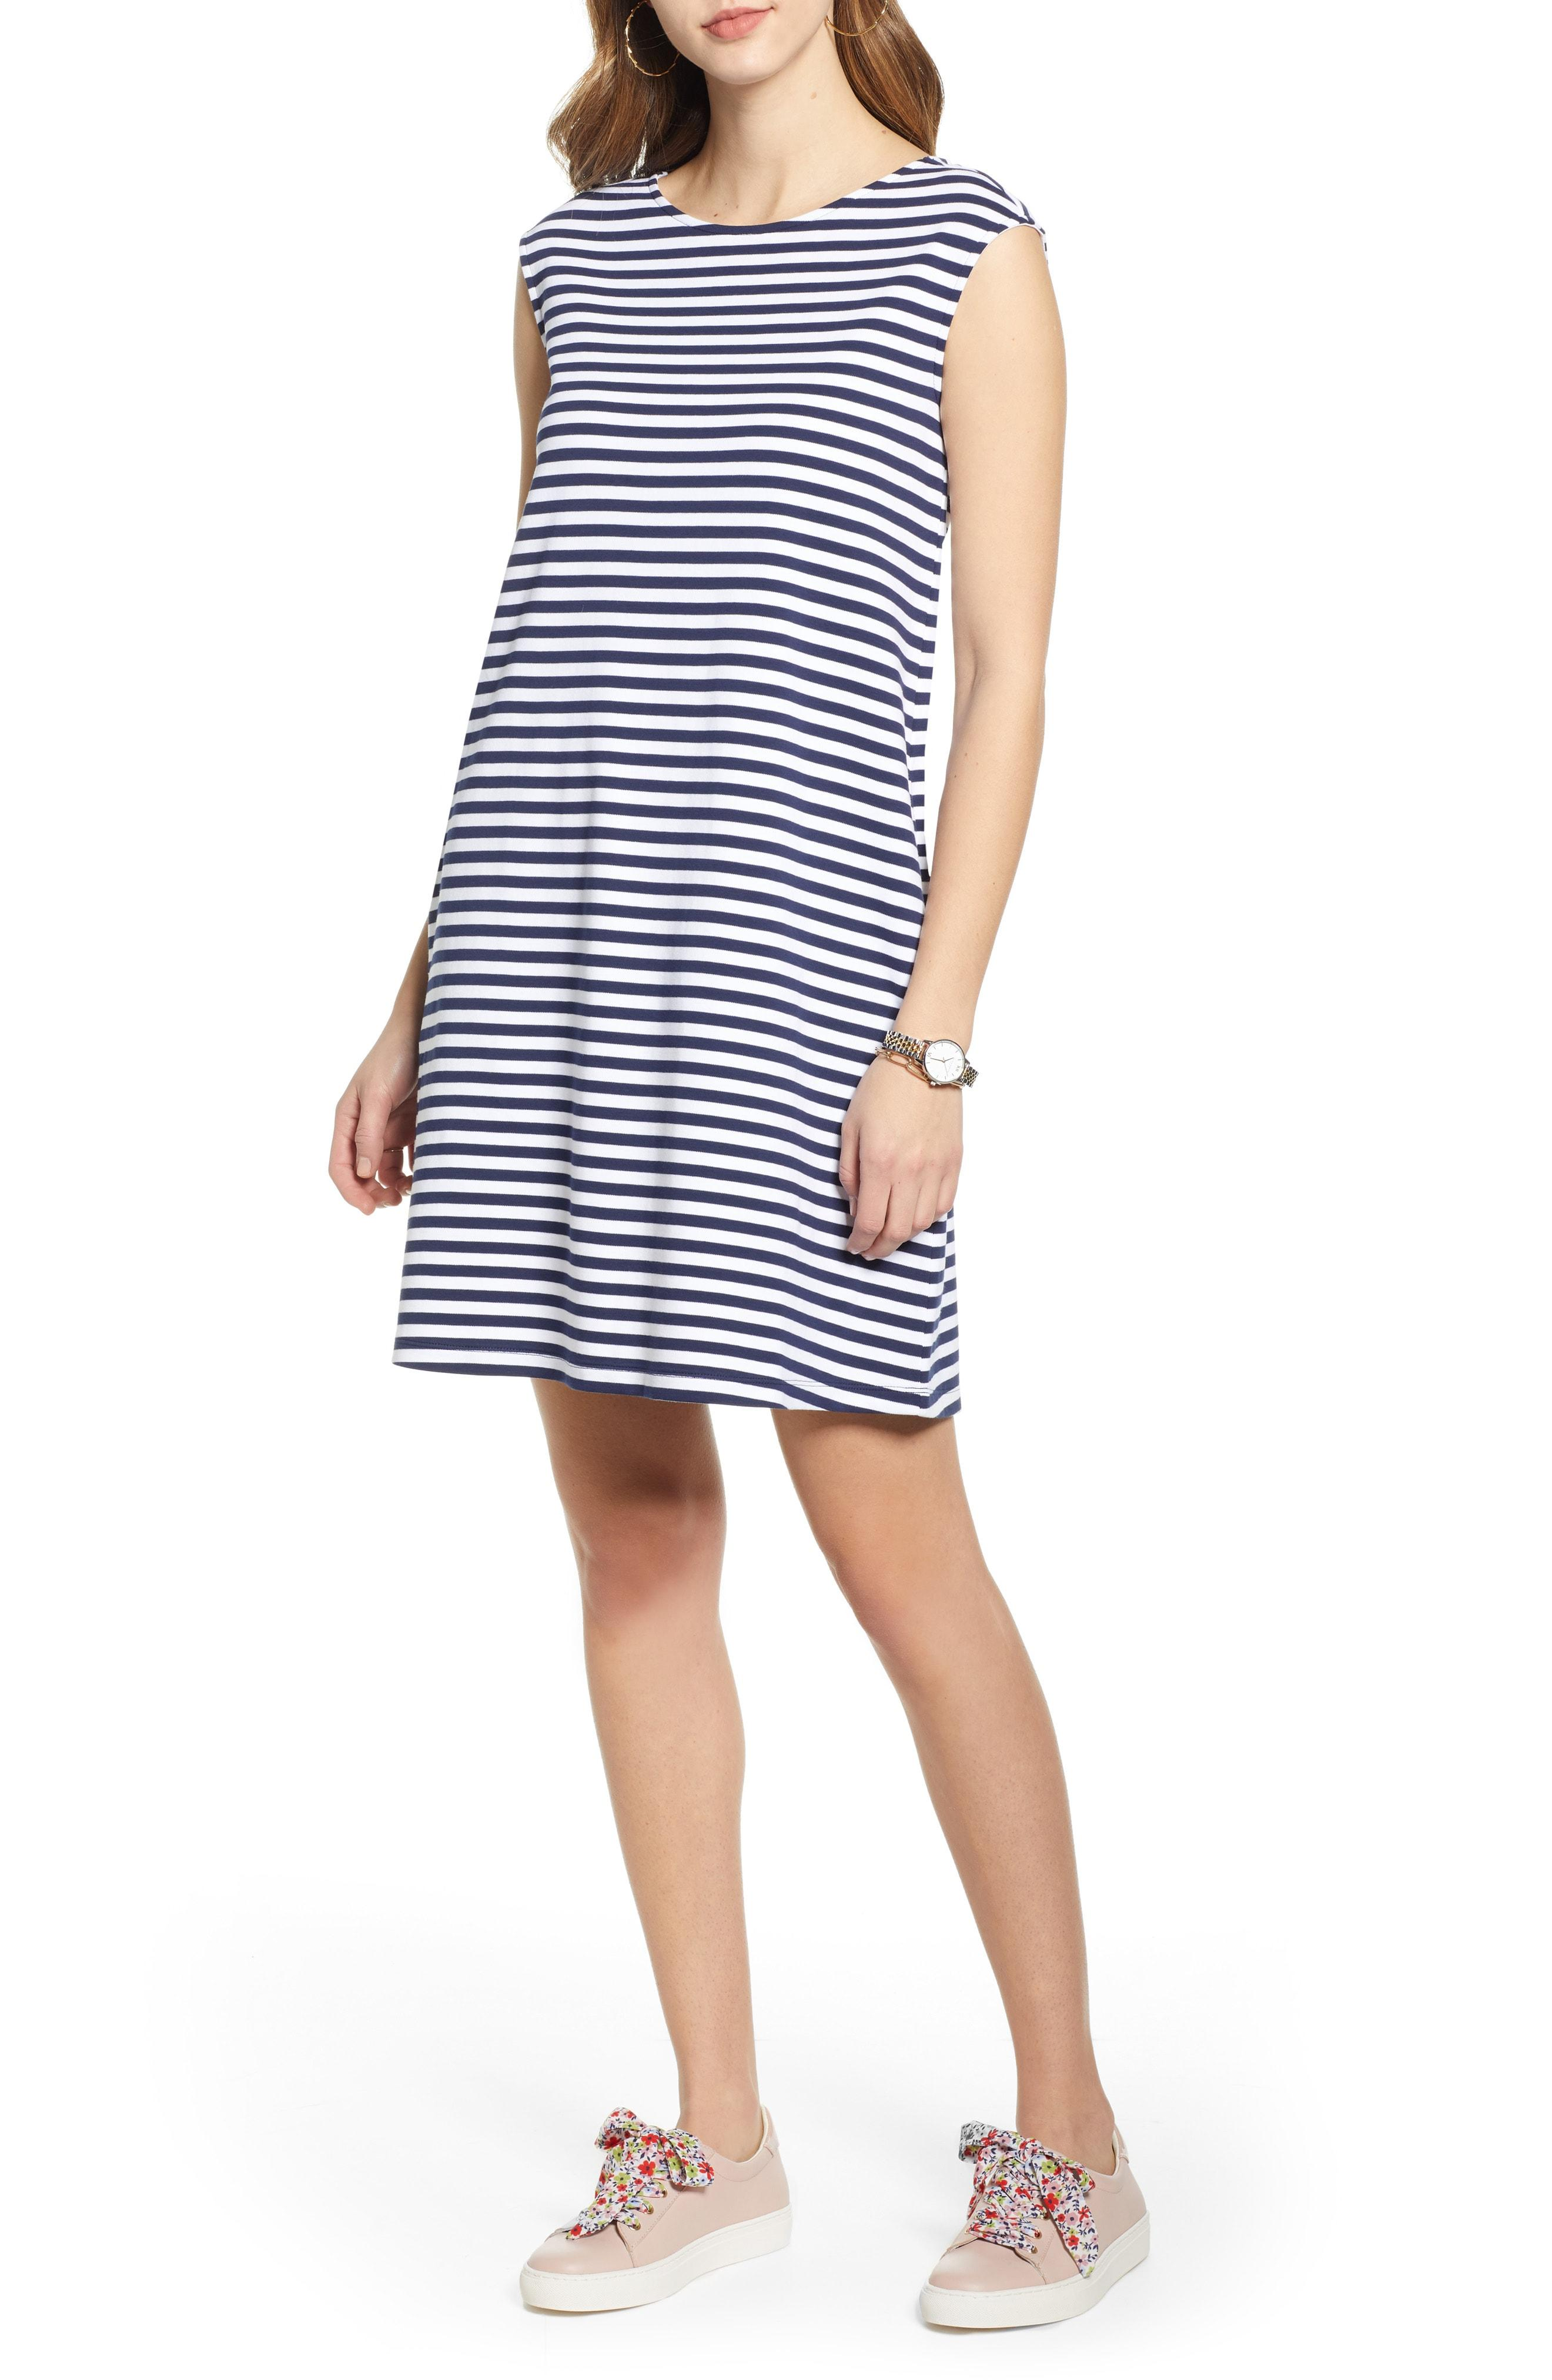 6e02fe08bf64 Lyst - Nordstrom 1901 Stripe Shift Dress in Blue